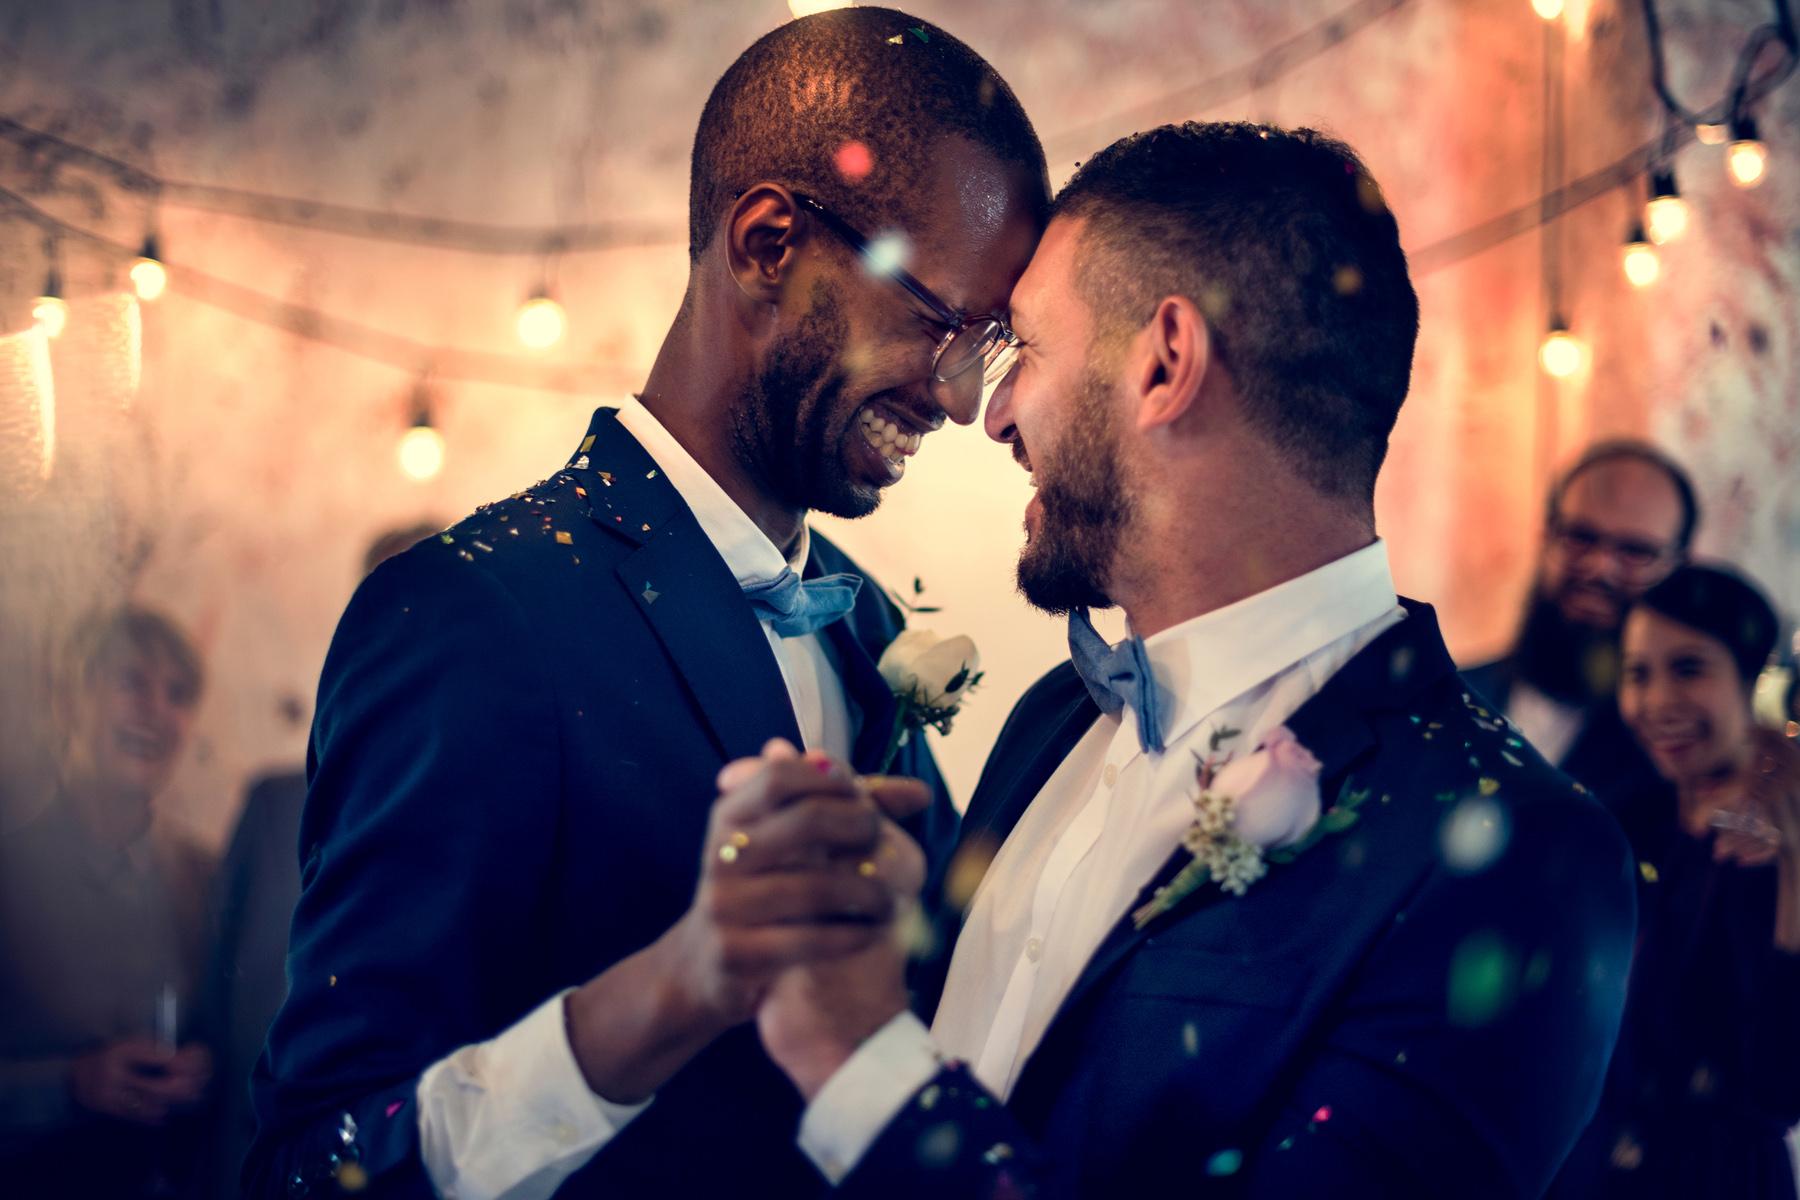 Gay couple at their wedding